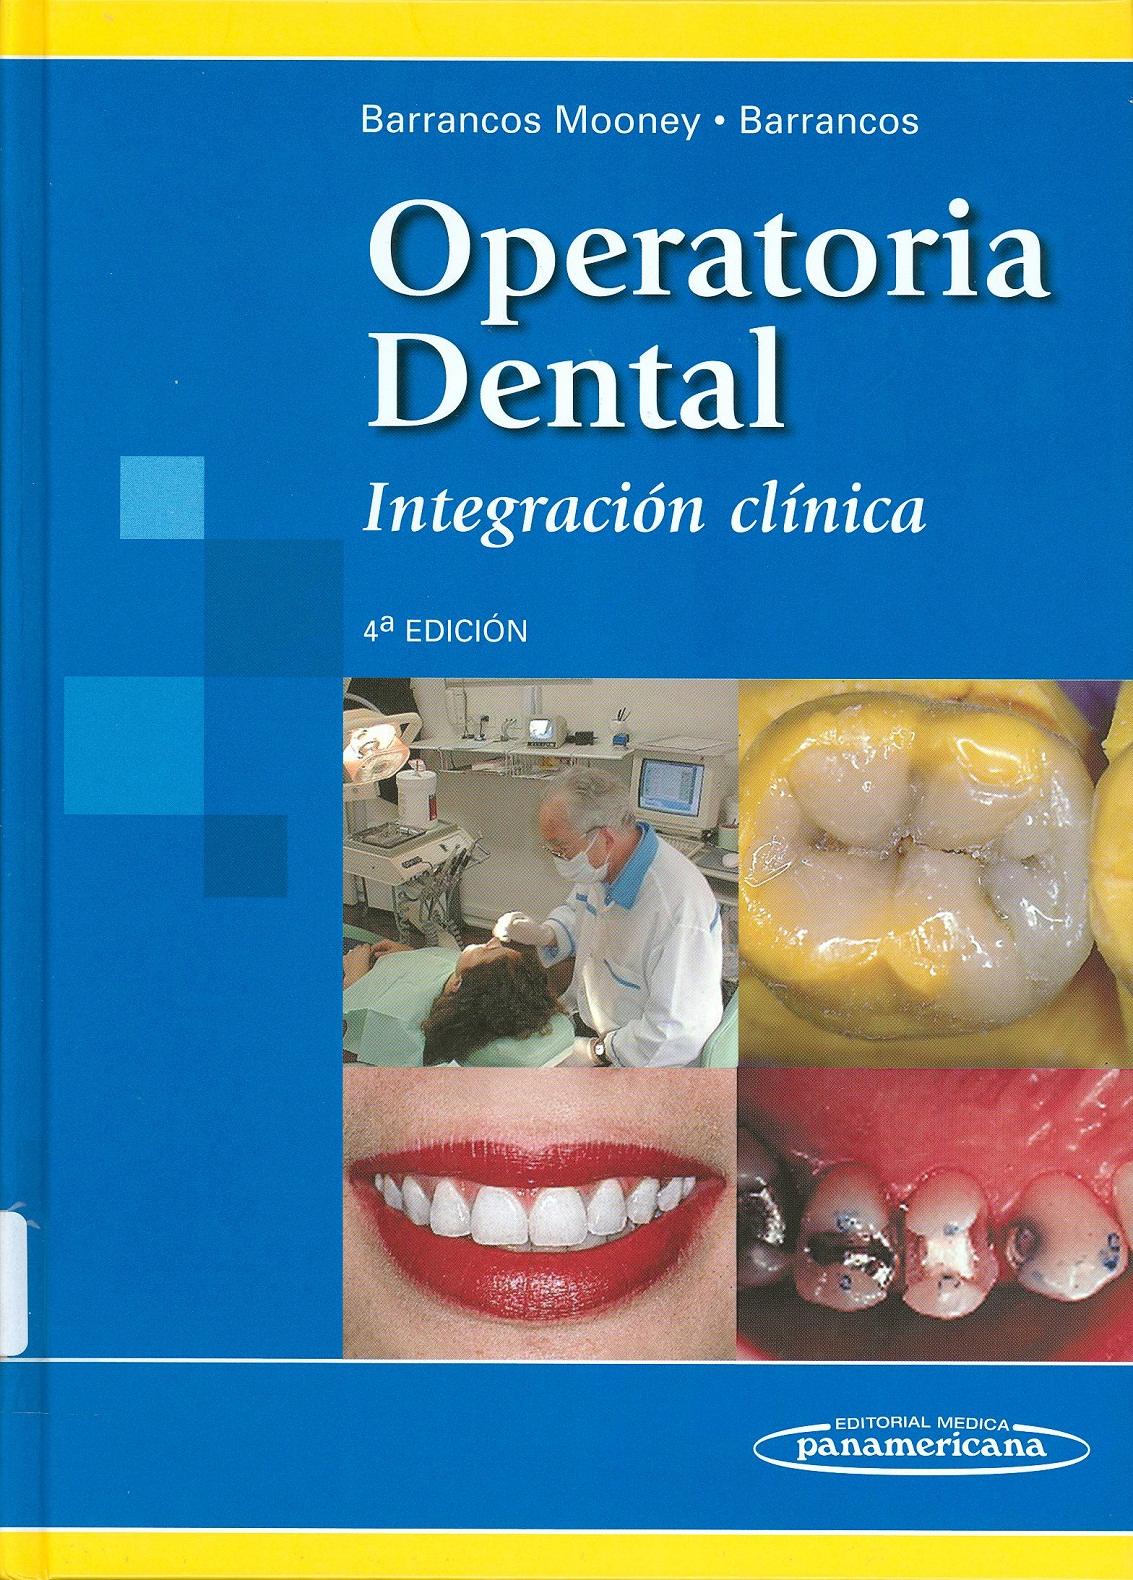 Libro De Operatoria Dental De Barrancos Pdf Download